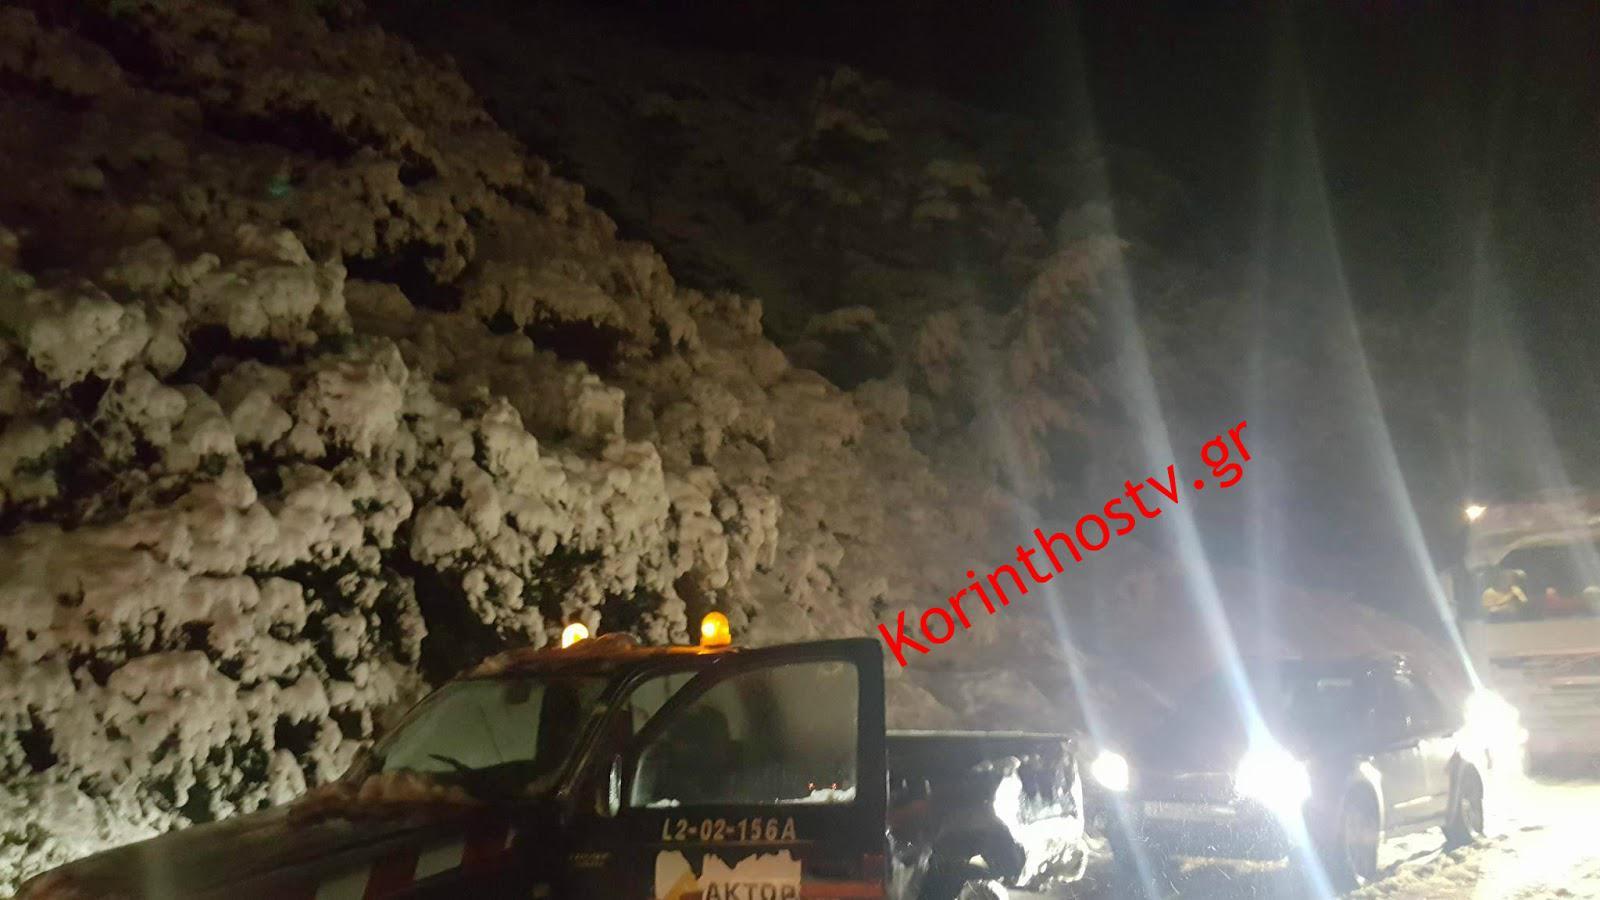 patrrra_0 Ανυποχώρητος ο χιονιάς - Τρεις νεκροί και τεράστια προβλήματα σε όλη τη χώρα [εικόνες]